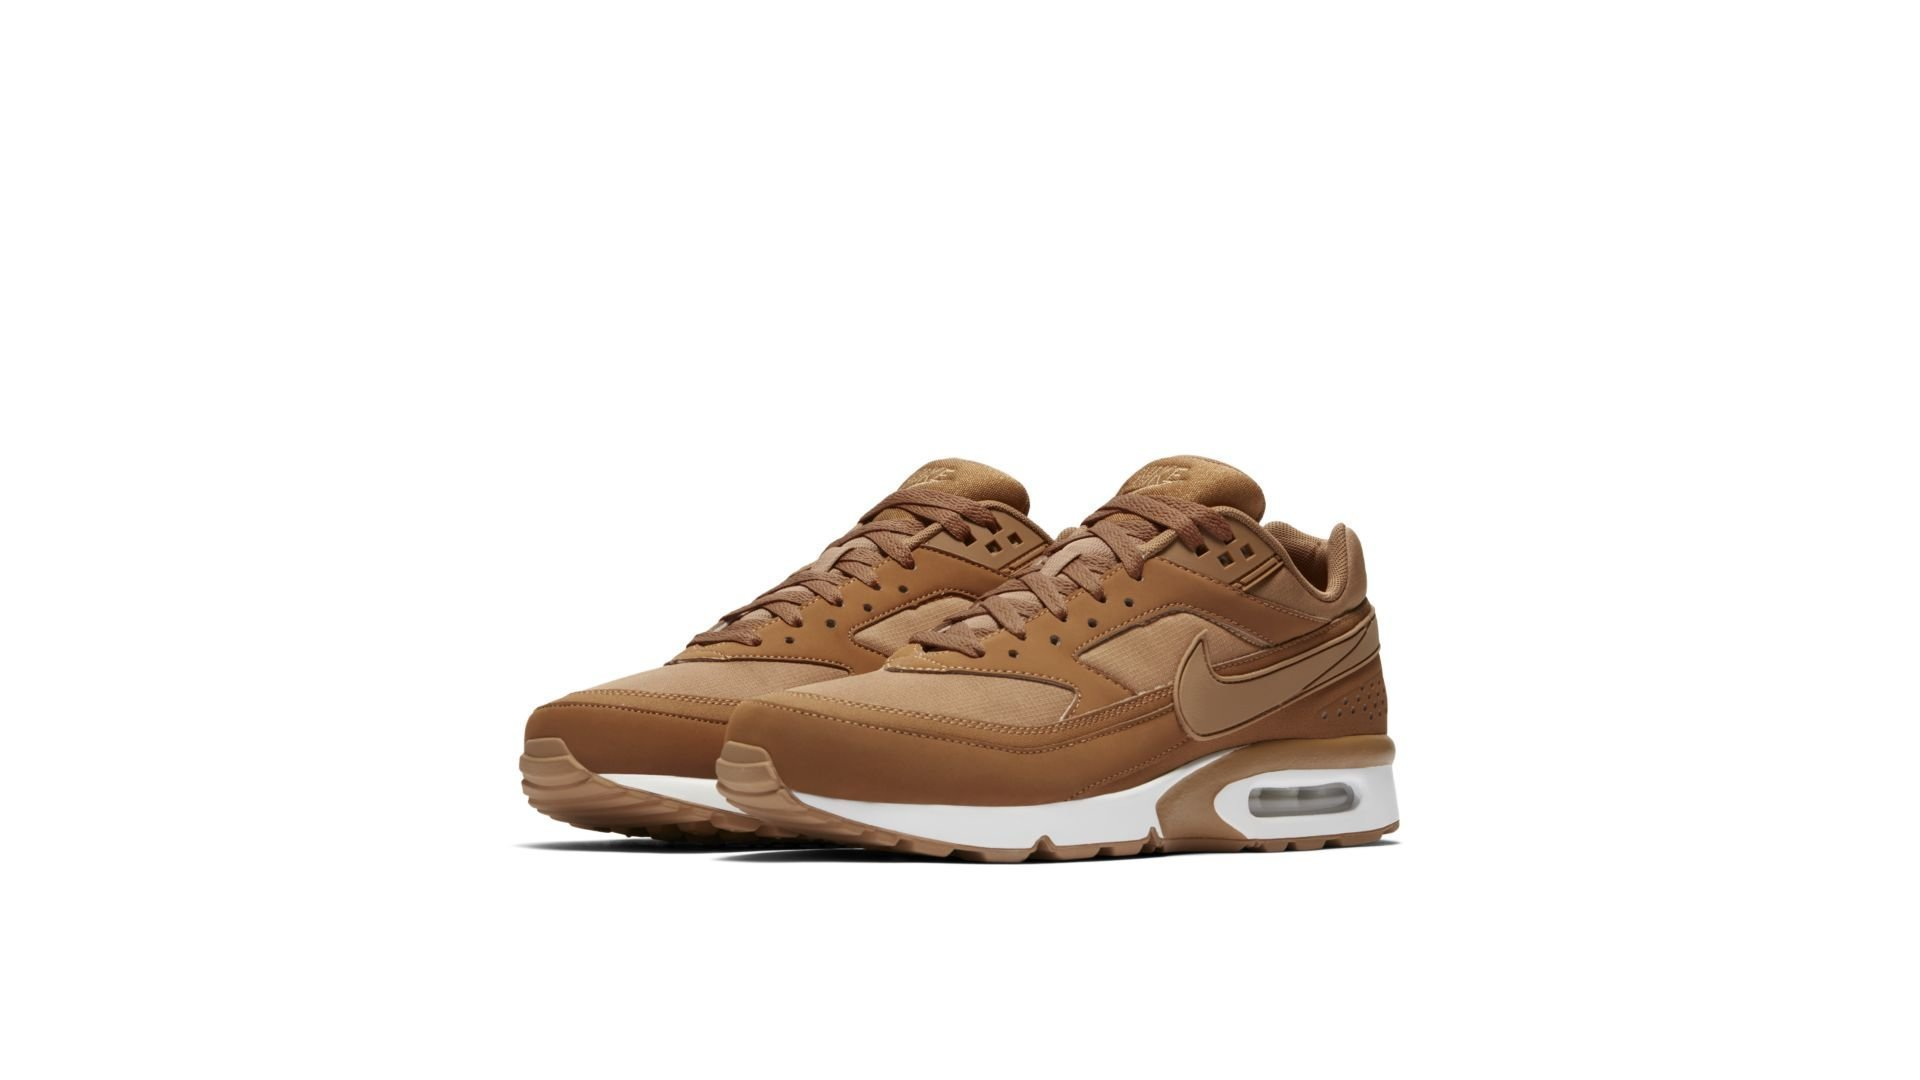 Nike Air Max BW 881981-200